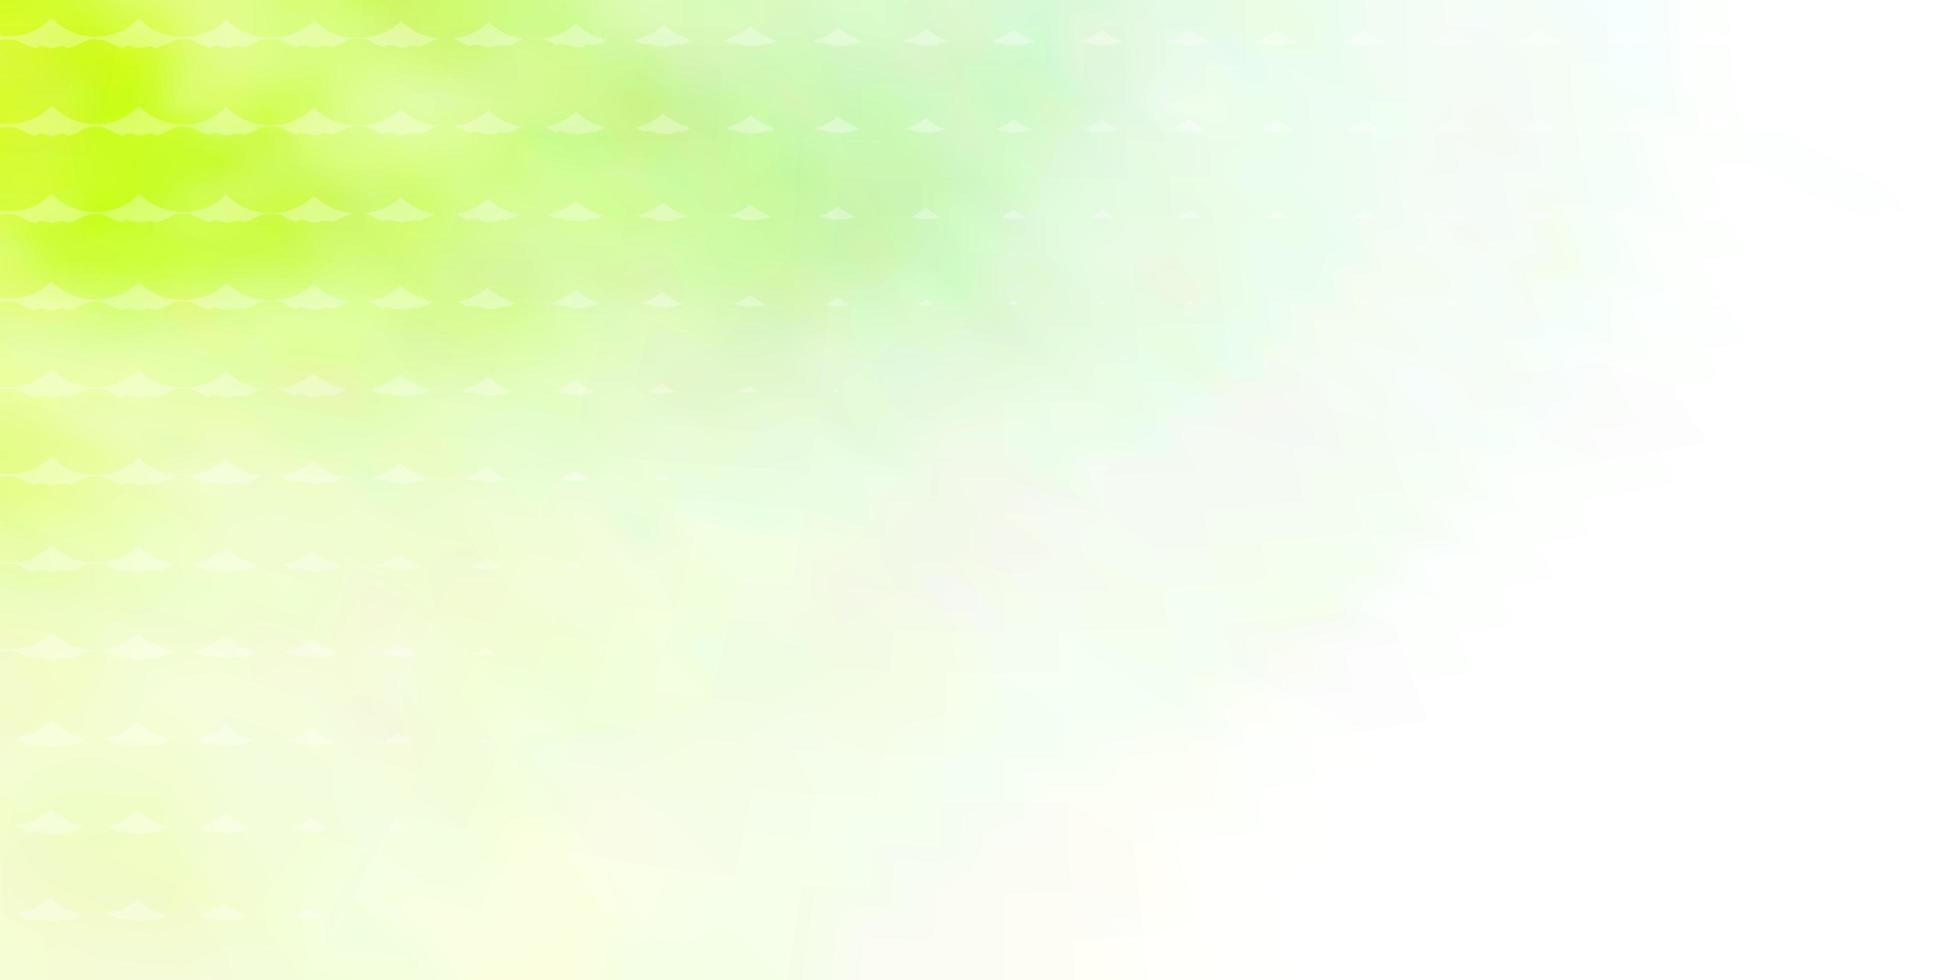 lichtgroene achtergrond met cirkels. vector